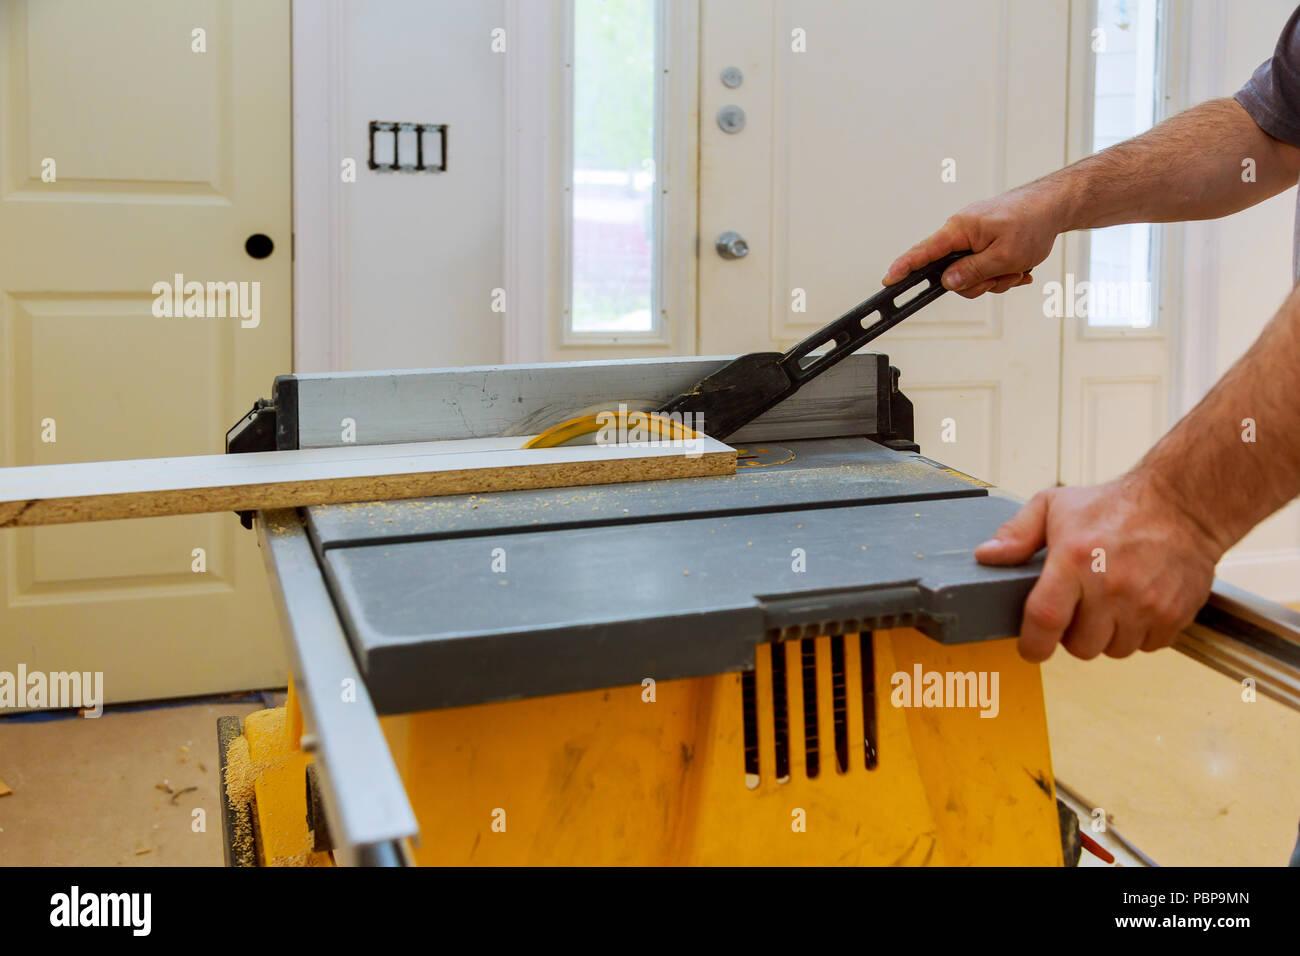 Excellent Carpenter Cutting Wooden Trim Board On With Circular Saw Download Free Architecture Designs Scobabritishbridgeorg